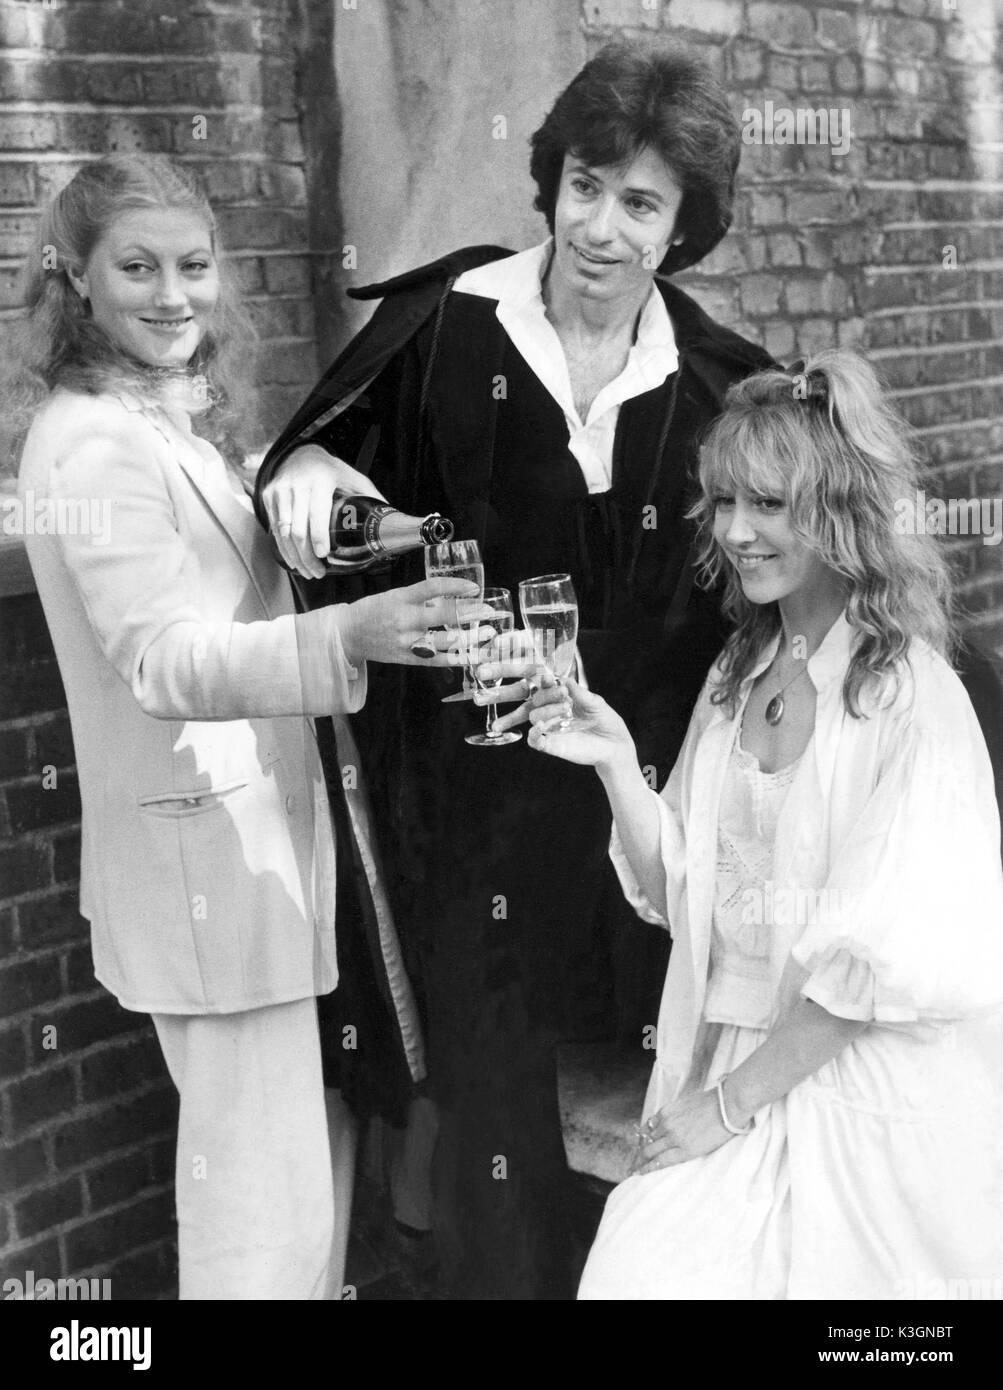 THE PASSION OF DRACULA [1978- 1979]  THE QUEEN'S THEATRE  SHAFTESBURY AVENUE, LONDON  GERALDINE JAMES as Dr. Helga Van Zandt,  GEORGE CHAKIRIS as Dracula,  BETH MORRIS as Wilhelmina Murray THE PASSION OF DRACULA [1978]  The Queen's Theatre  Shaftesbury Avenue, London  GERALDINE JAMES, GEORGE CHAKIRIS,  BETH MORRIS - Stock Image